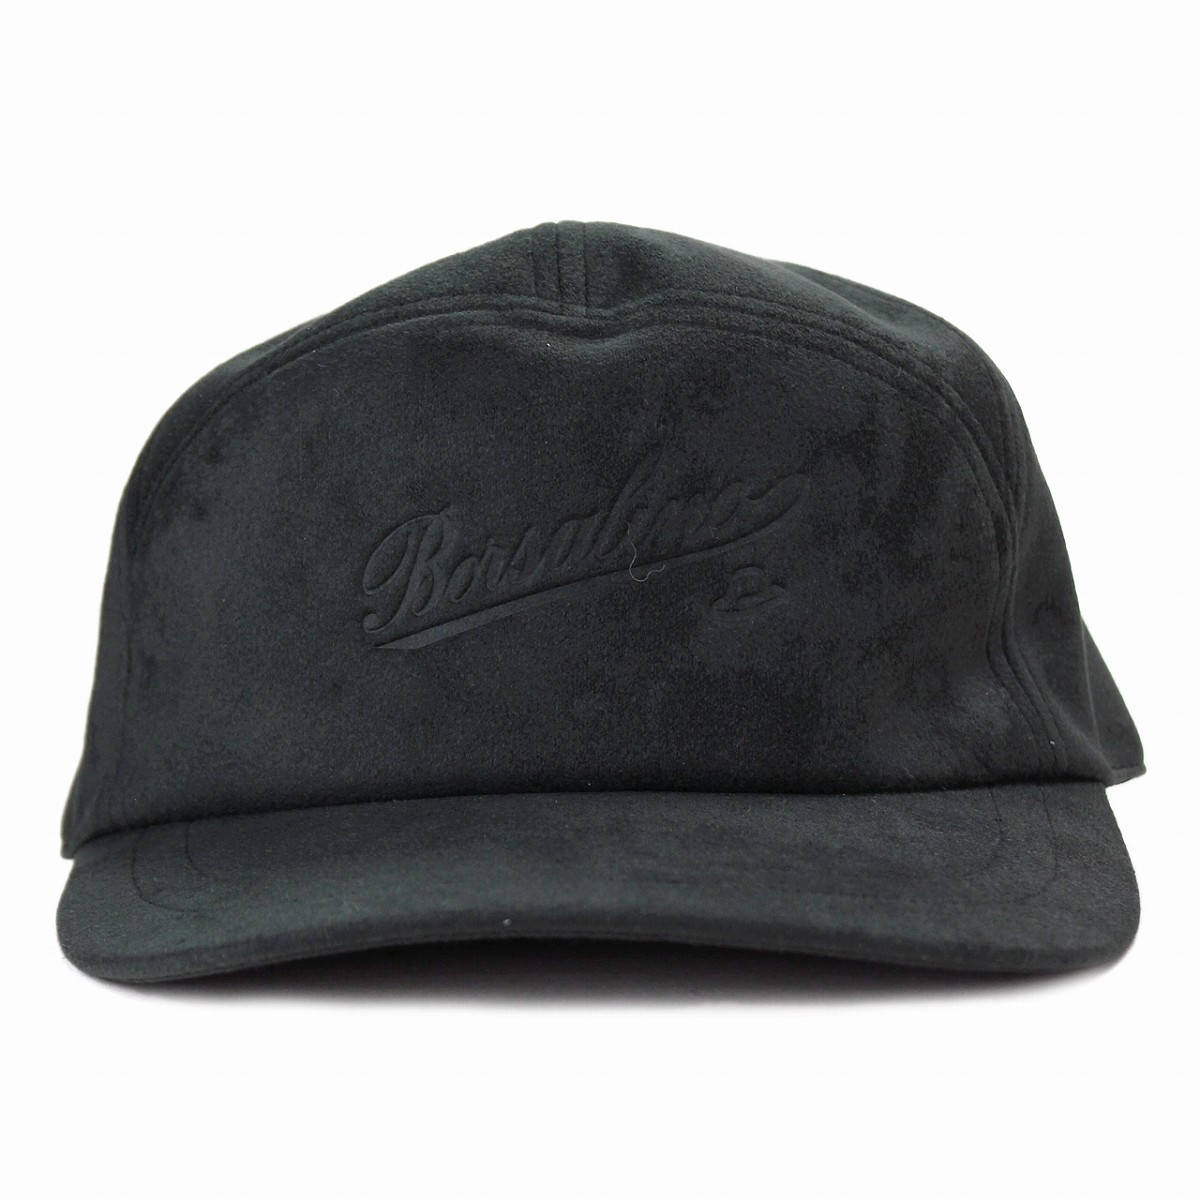 7d6f7a2ff5c Baseball cap gentleman adult Shin pull S M L LL 3L back adjuster size  adjustable fashion   dark gray  baseball cap  Christmas present Borsalino  hat mail ...